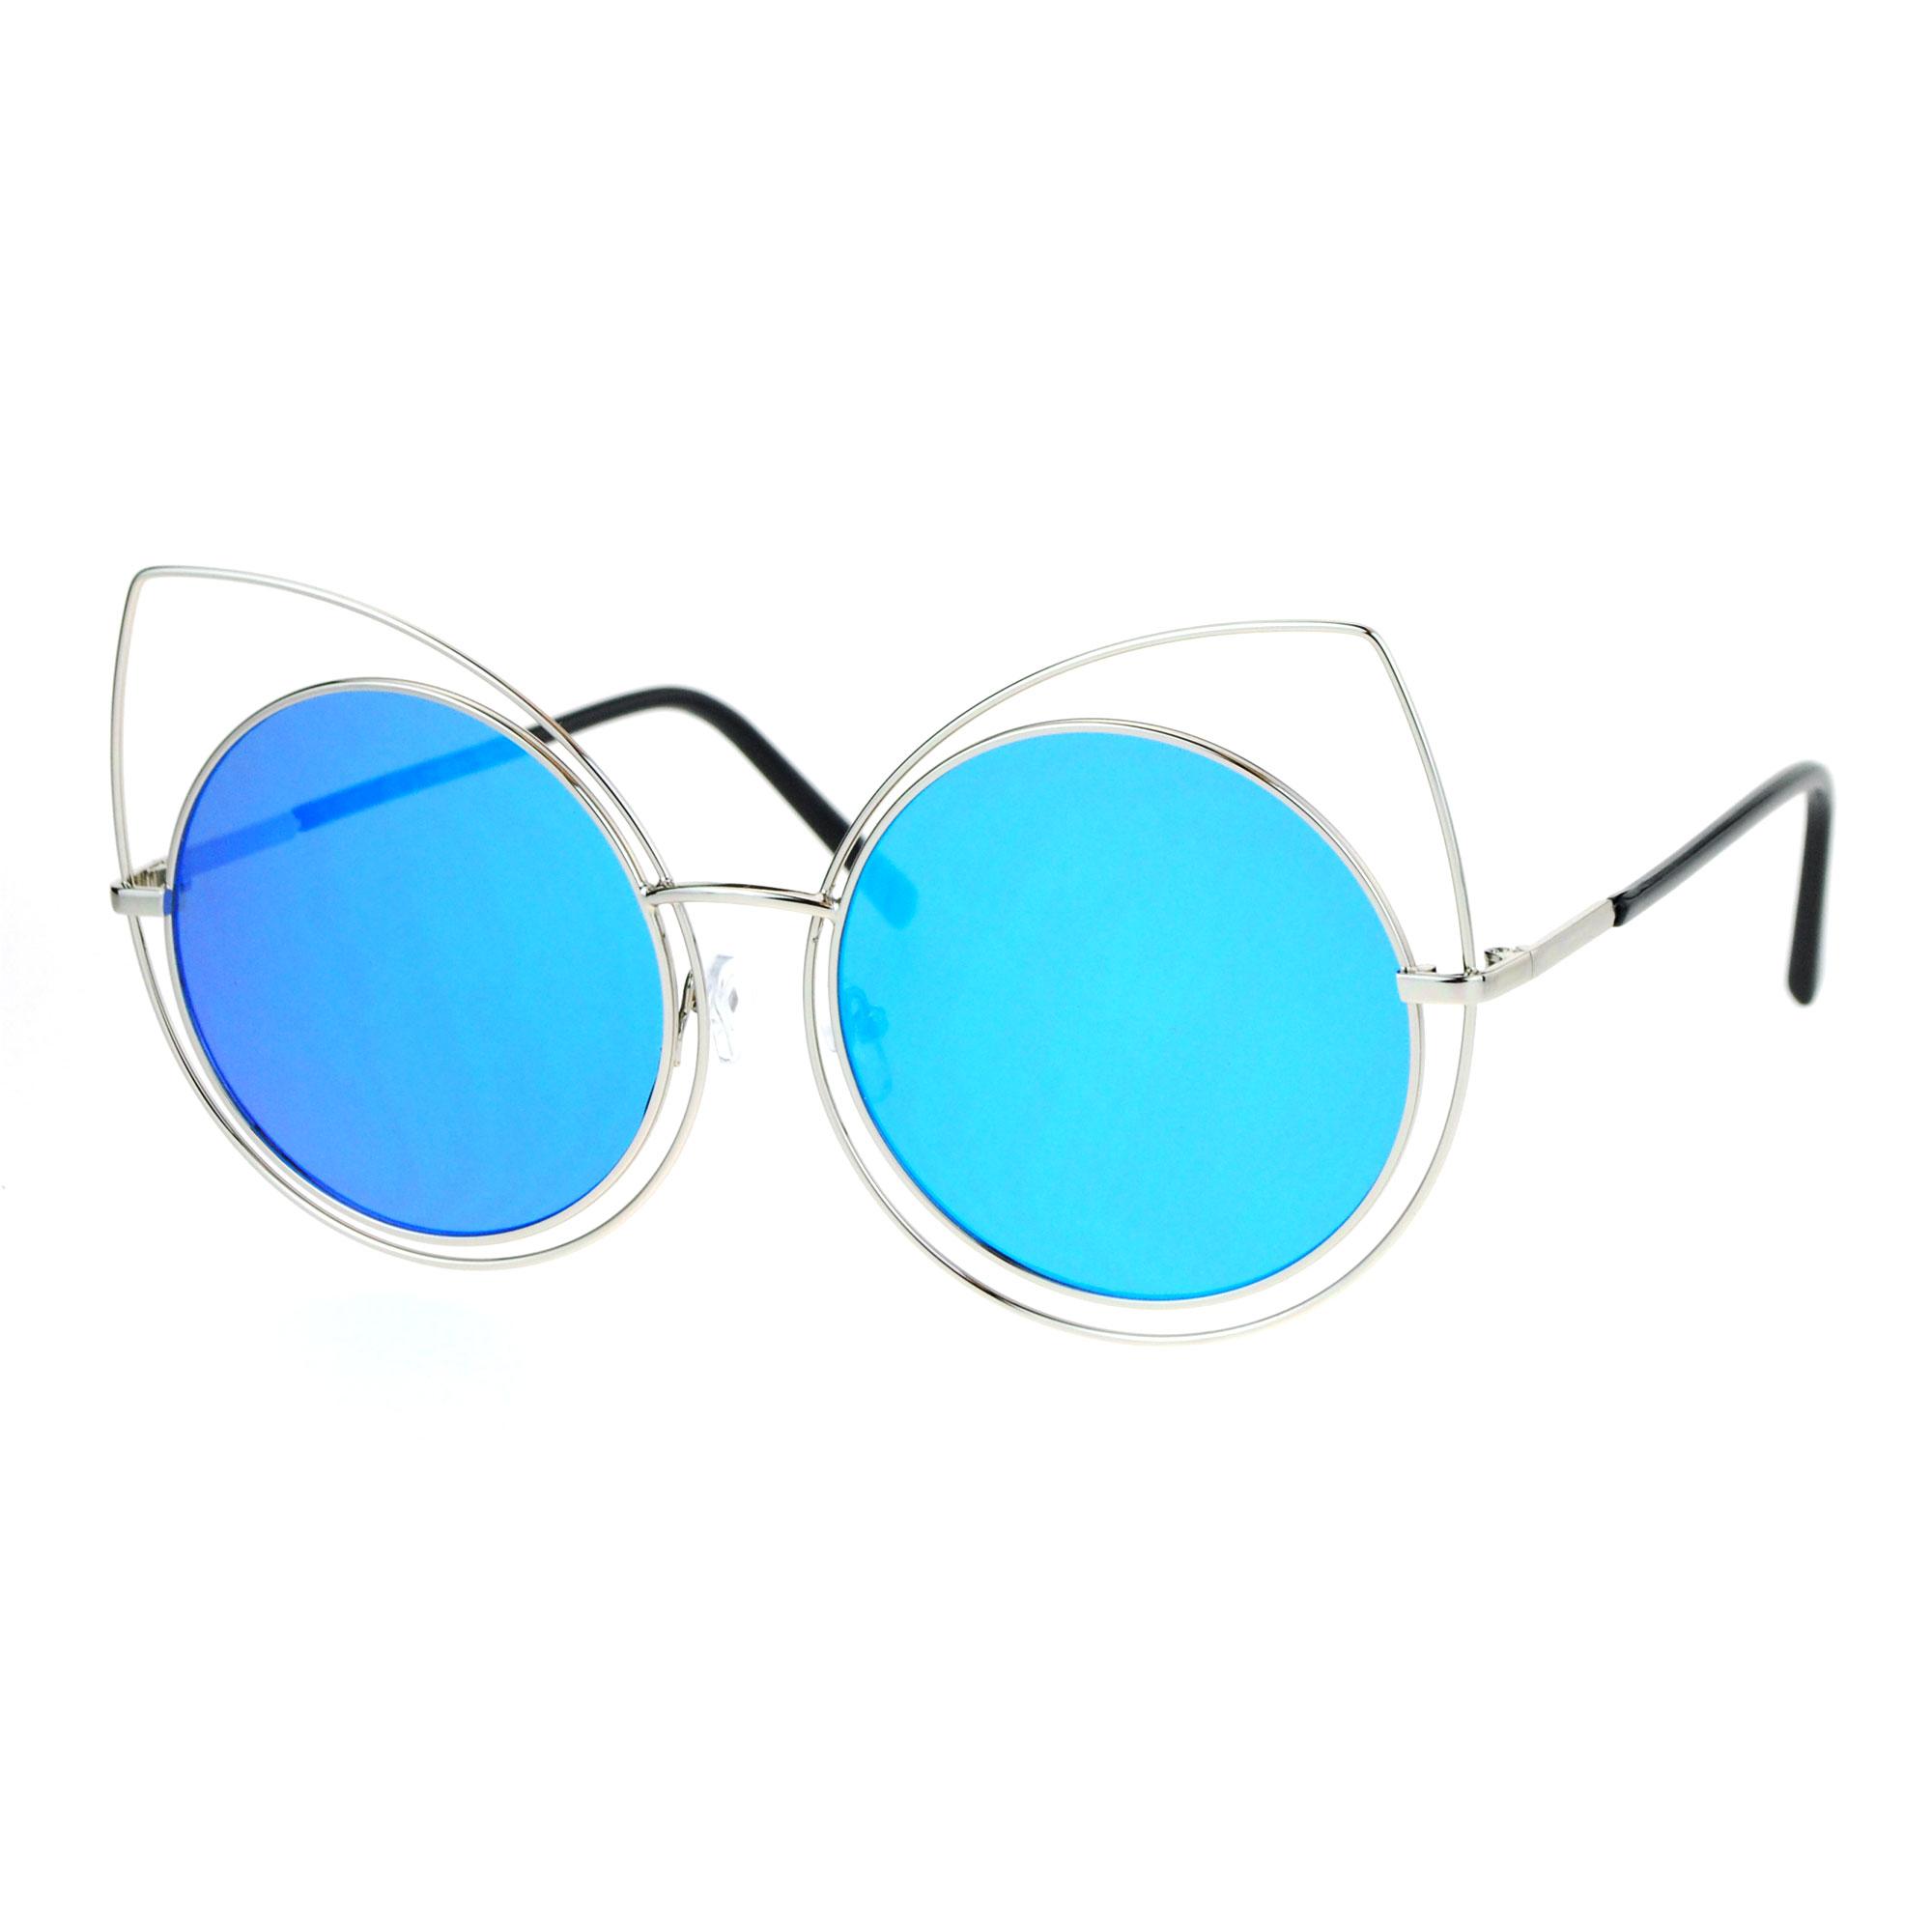 SA106 Womens Wire Rim Bat Cat Eye Round Circle Lens Retro Sunglasses ...